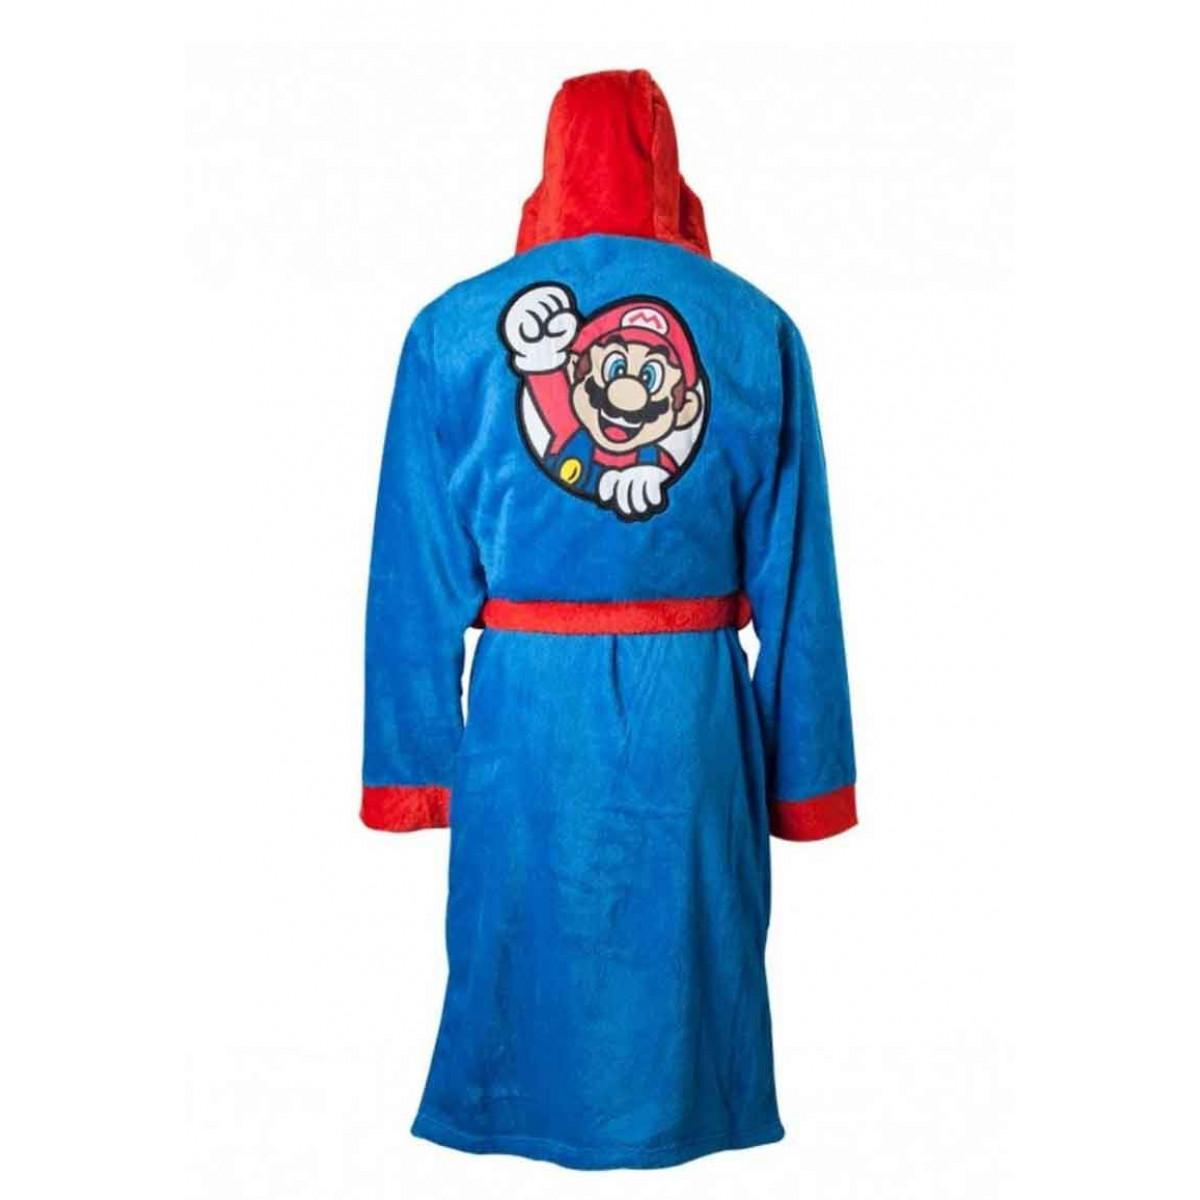 Herenbadjas Super Mario Bros - nitendo